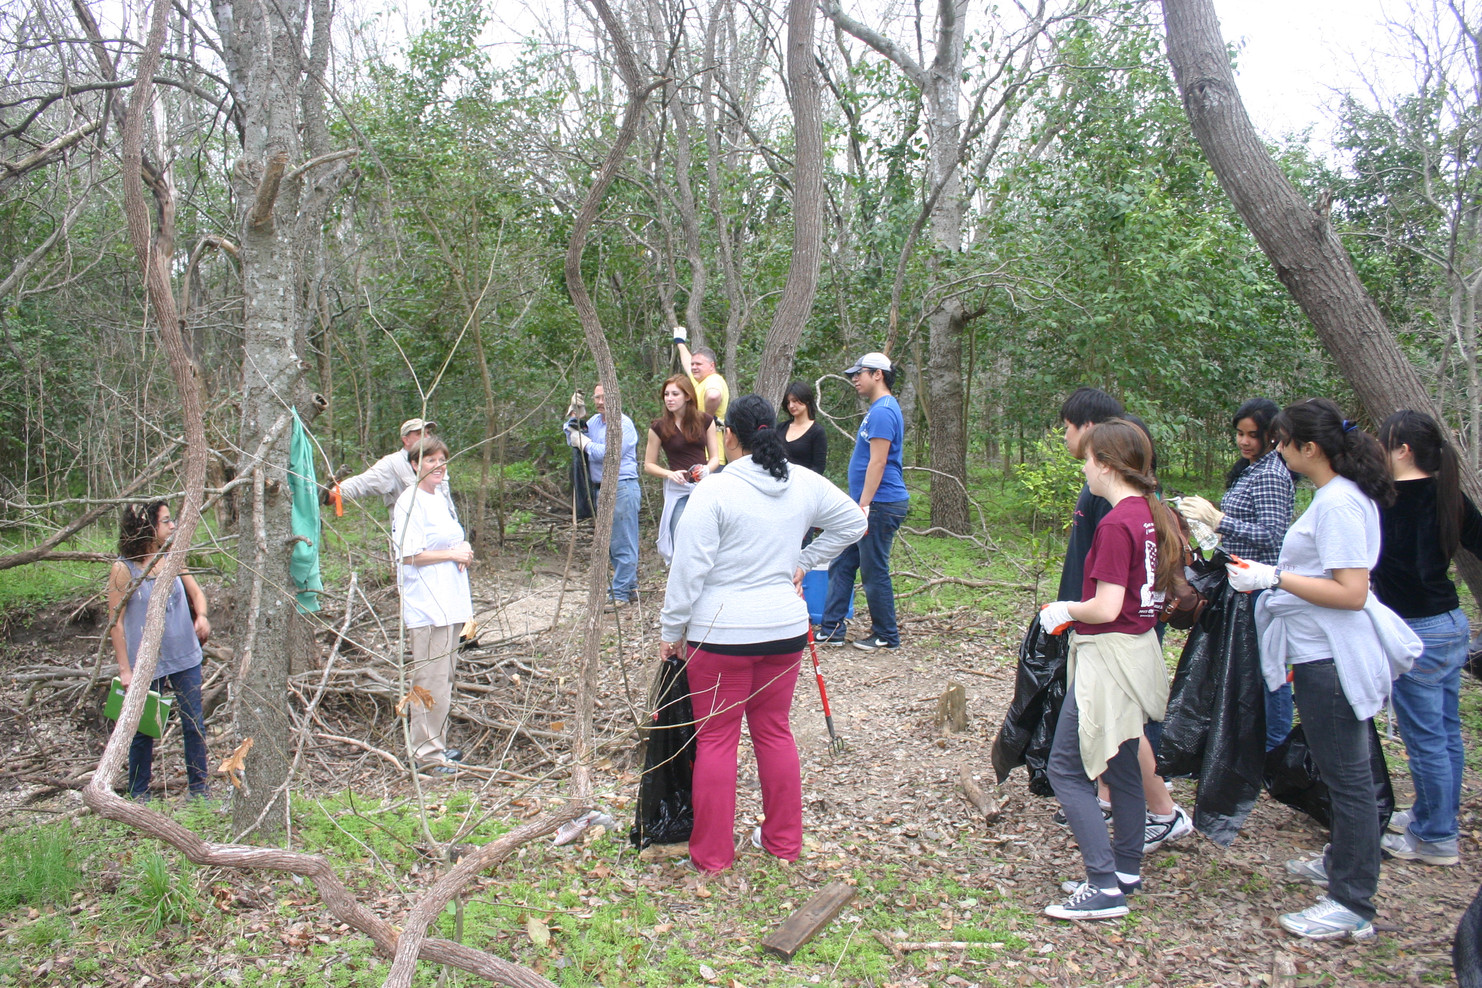 Volunteers help clear weeds on the Headwaters of the San Antonio River.